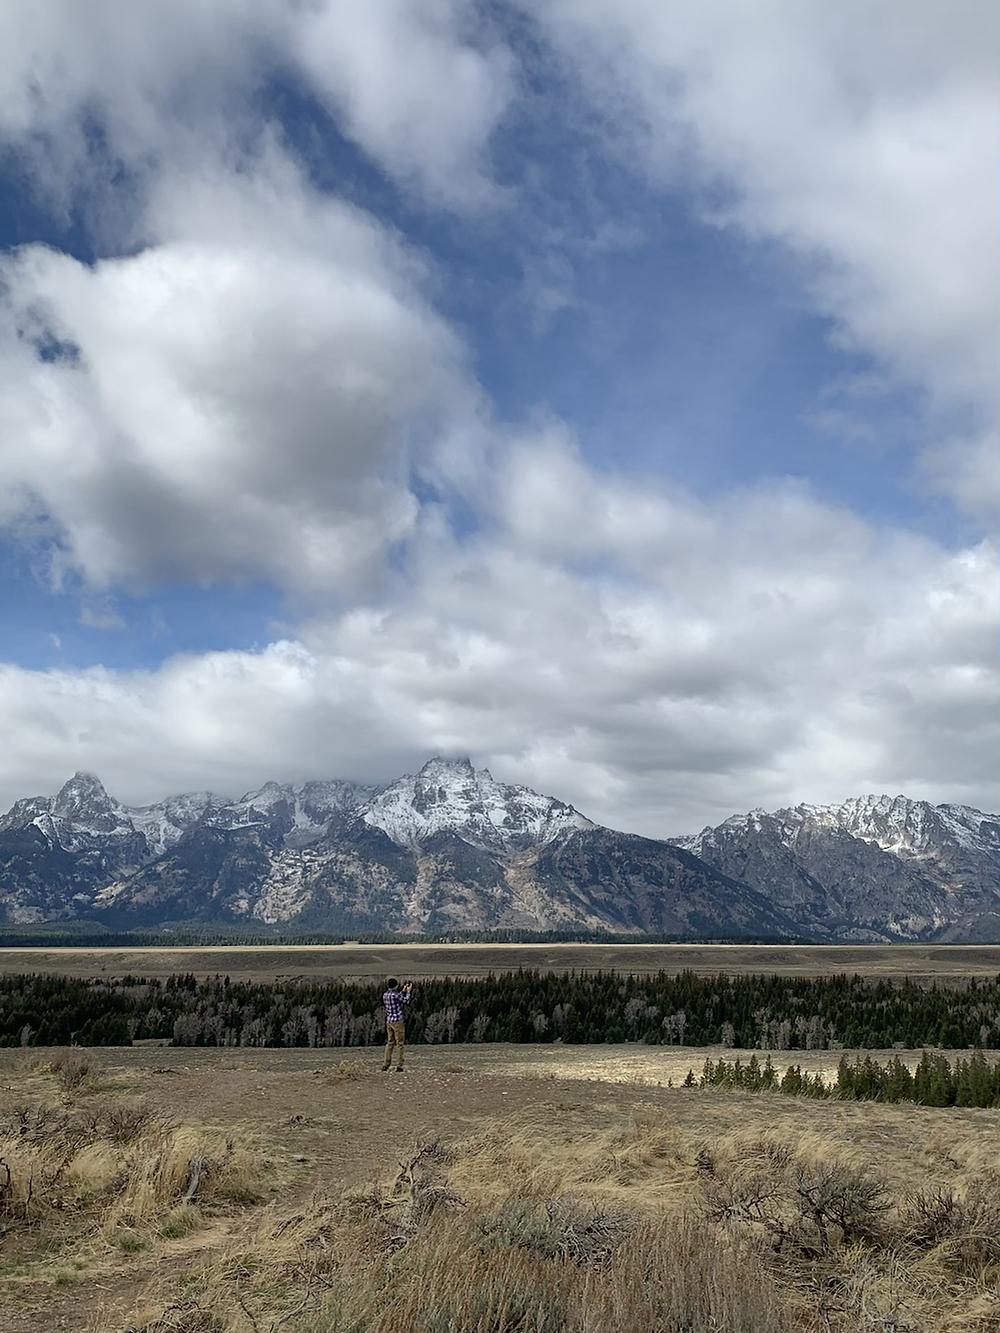 Grand Tetons, wyoming, mountains, jackson, jackson hole, mom, toddlers, road trip, wyoming